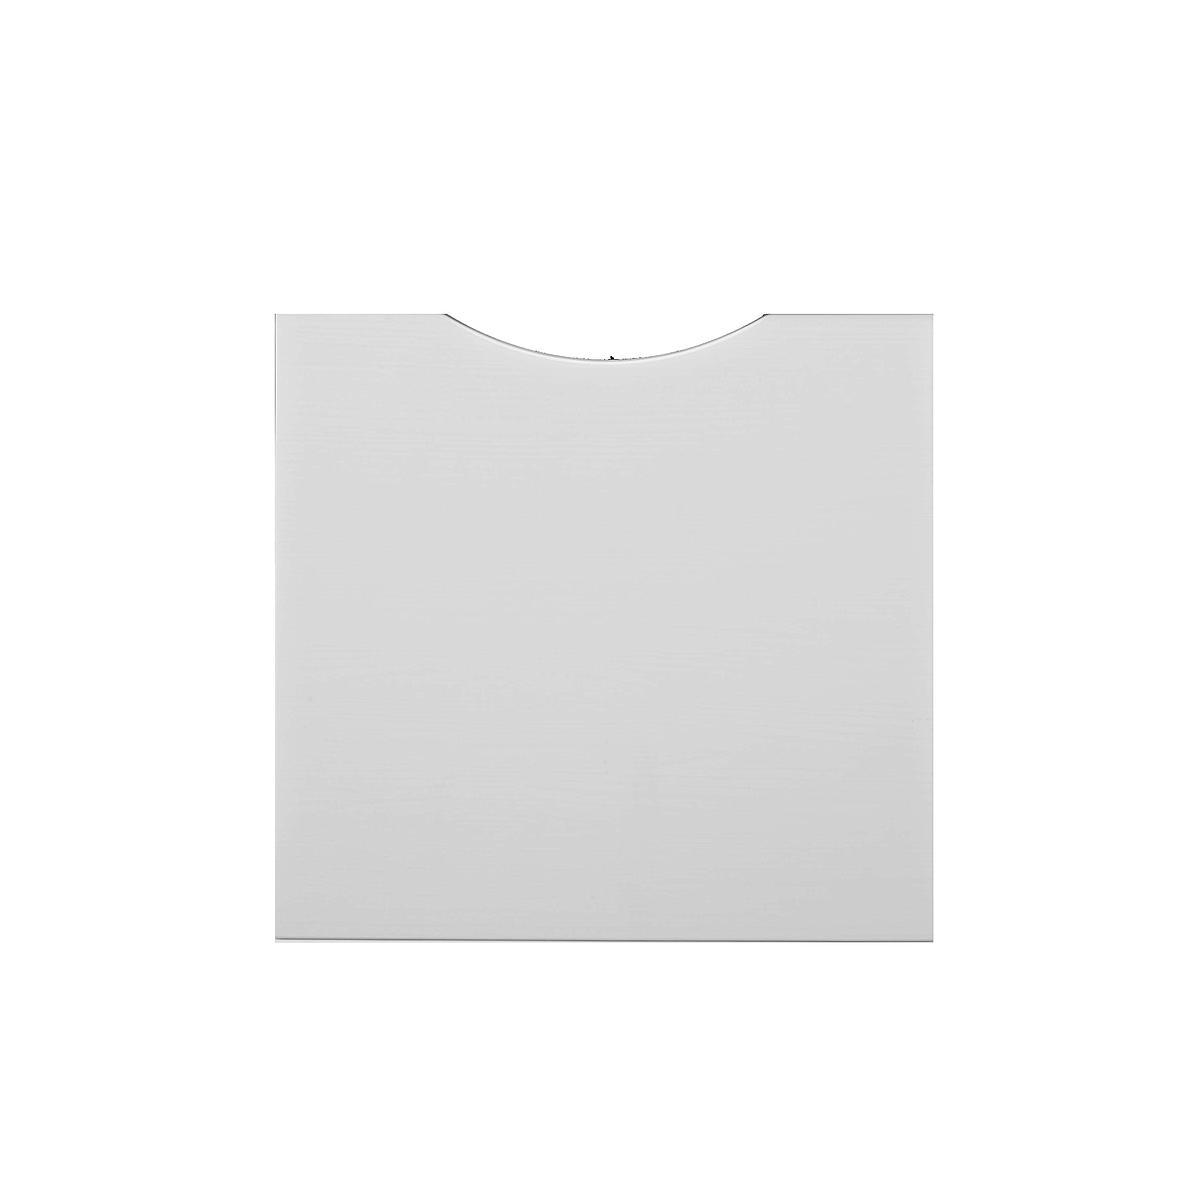 Cajón armario 50cm LifeTime blanco